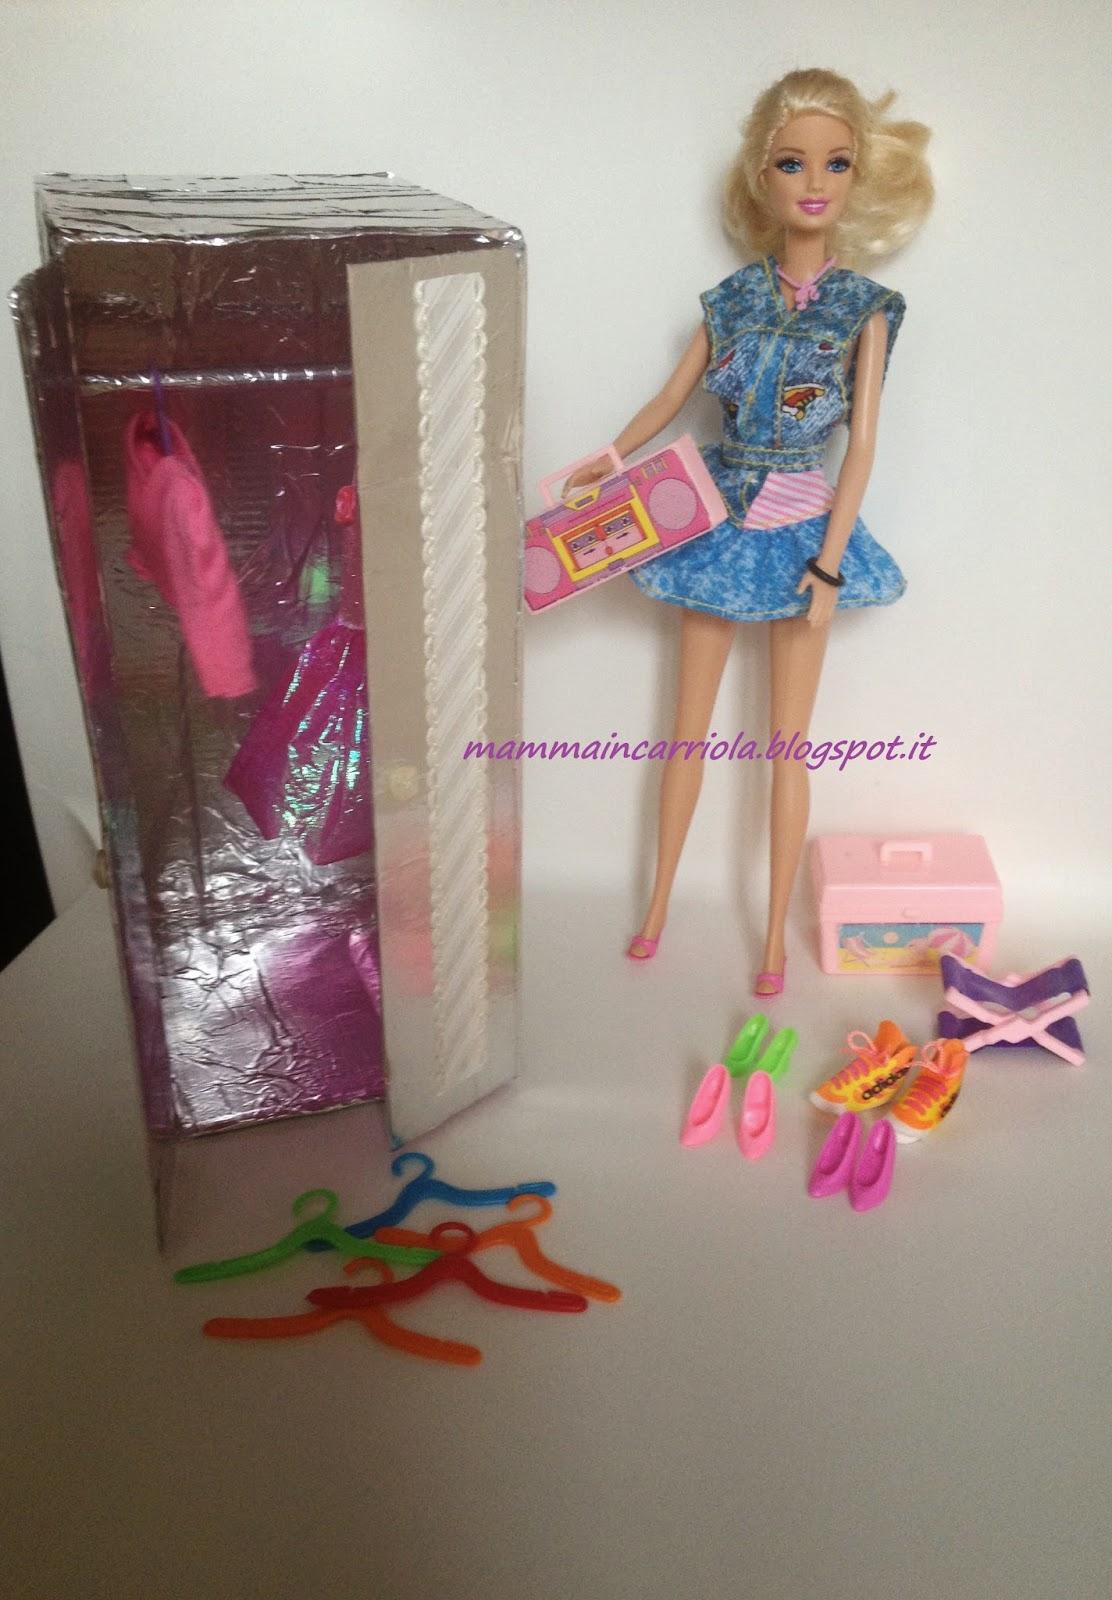 Mamma in carri ola armadio barbie fai da te tutorial for Casa delle barbie fai da te